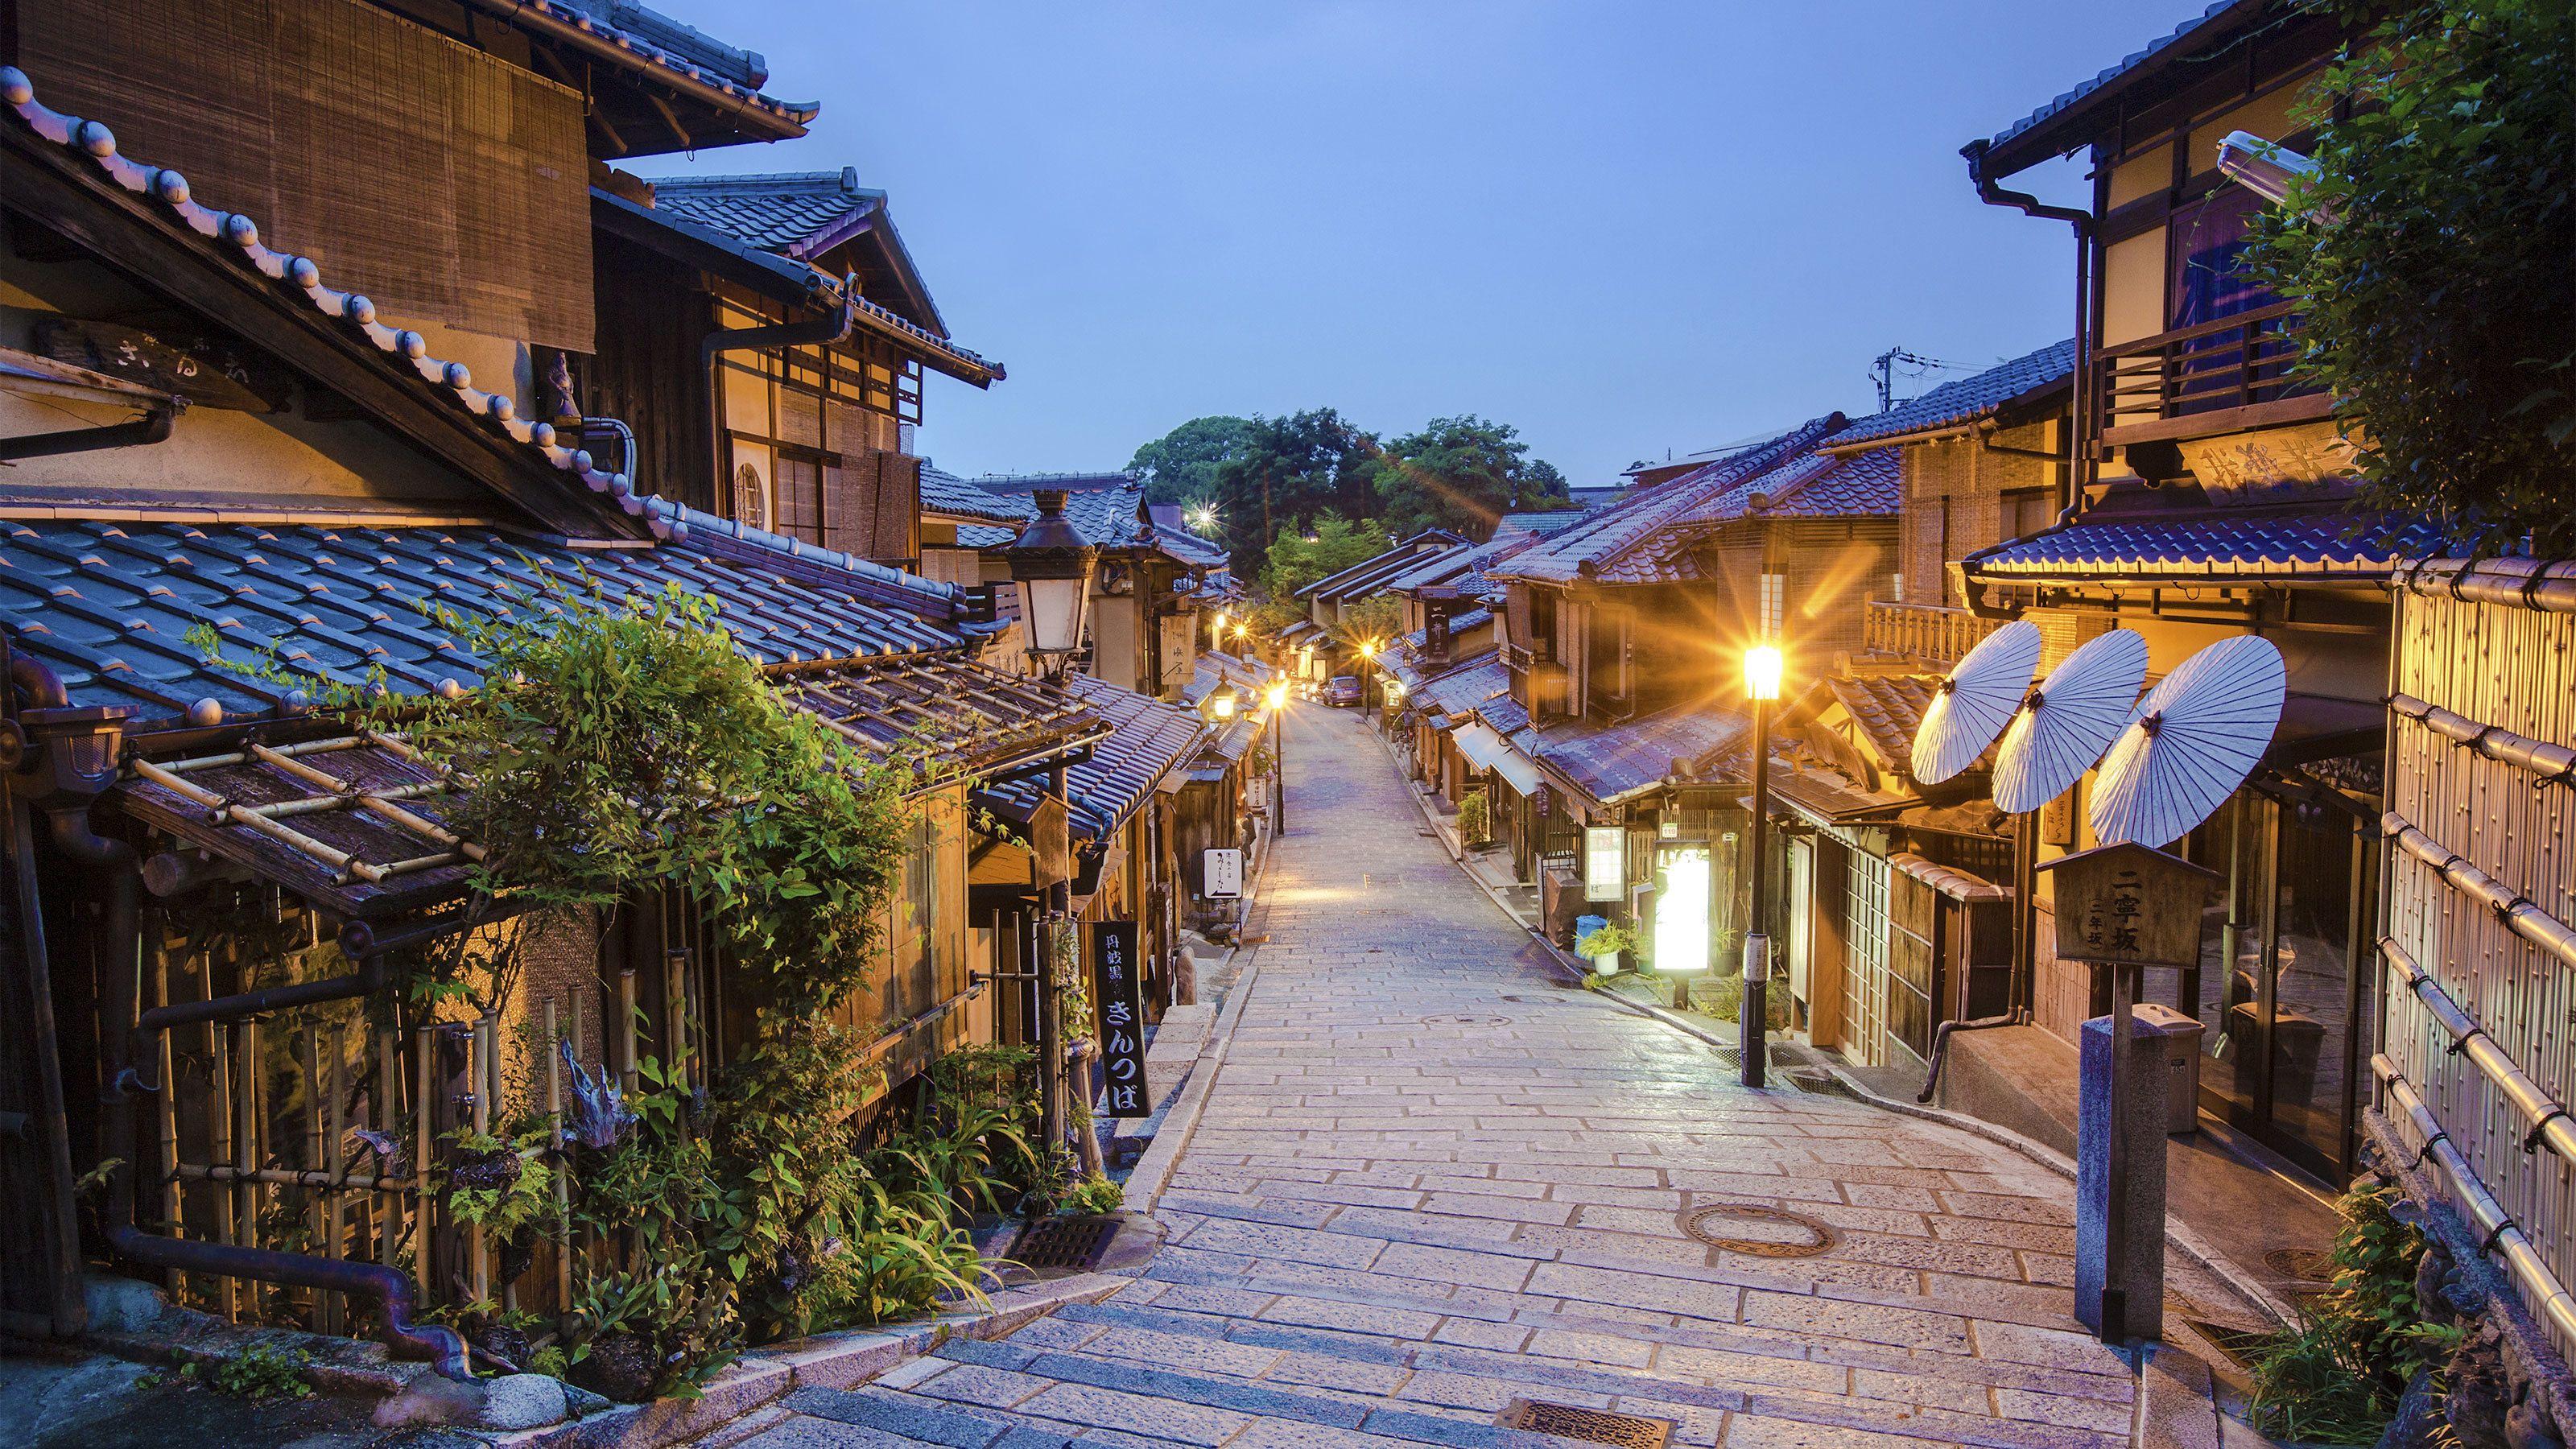 Night street view of Japan